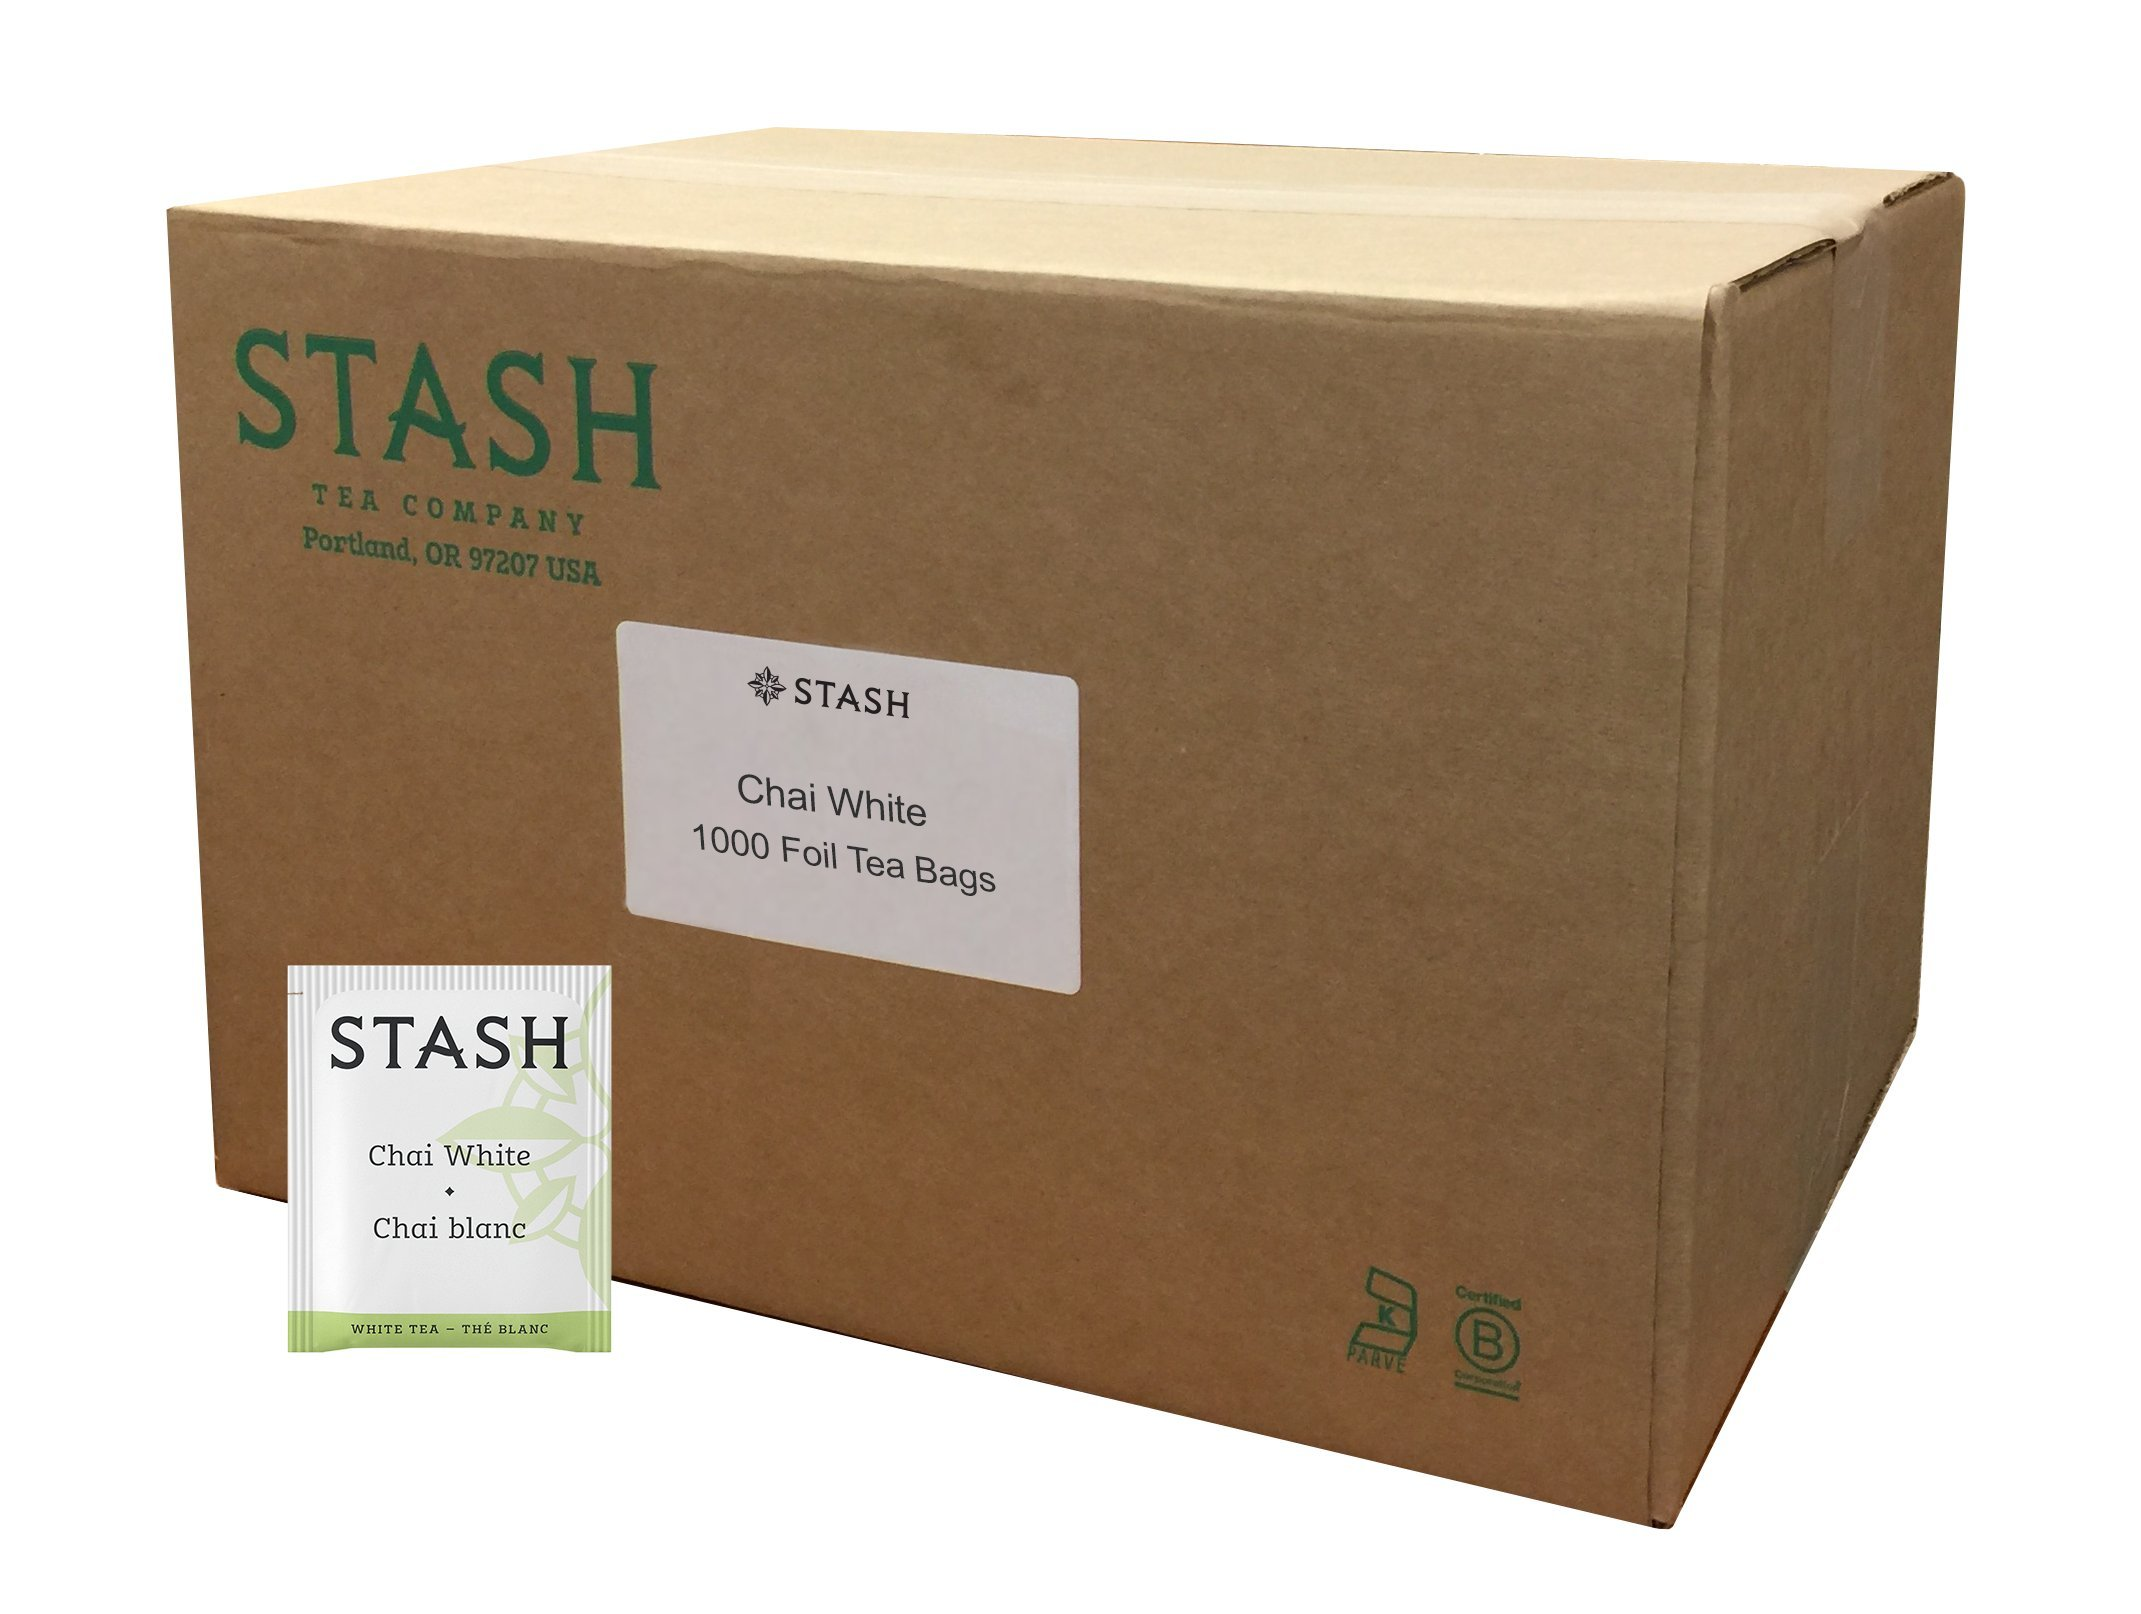 Stash Tea White Chai Tea 1000 Count Tea Bags in Foil Individual Spiced White Tea Bags for Use in Teapots Mugs or Cups, Brew Hot Tea or Iced Tea